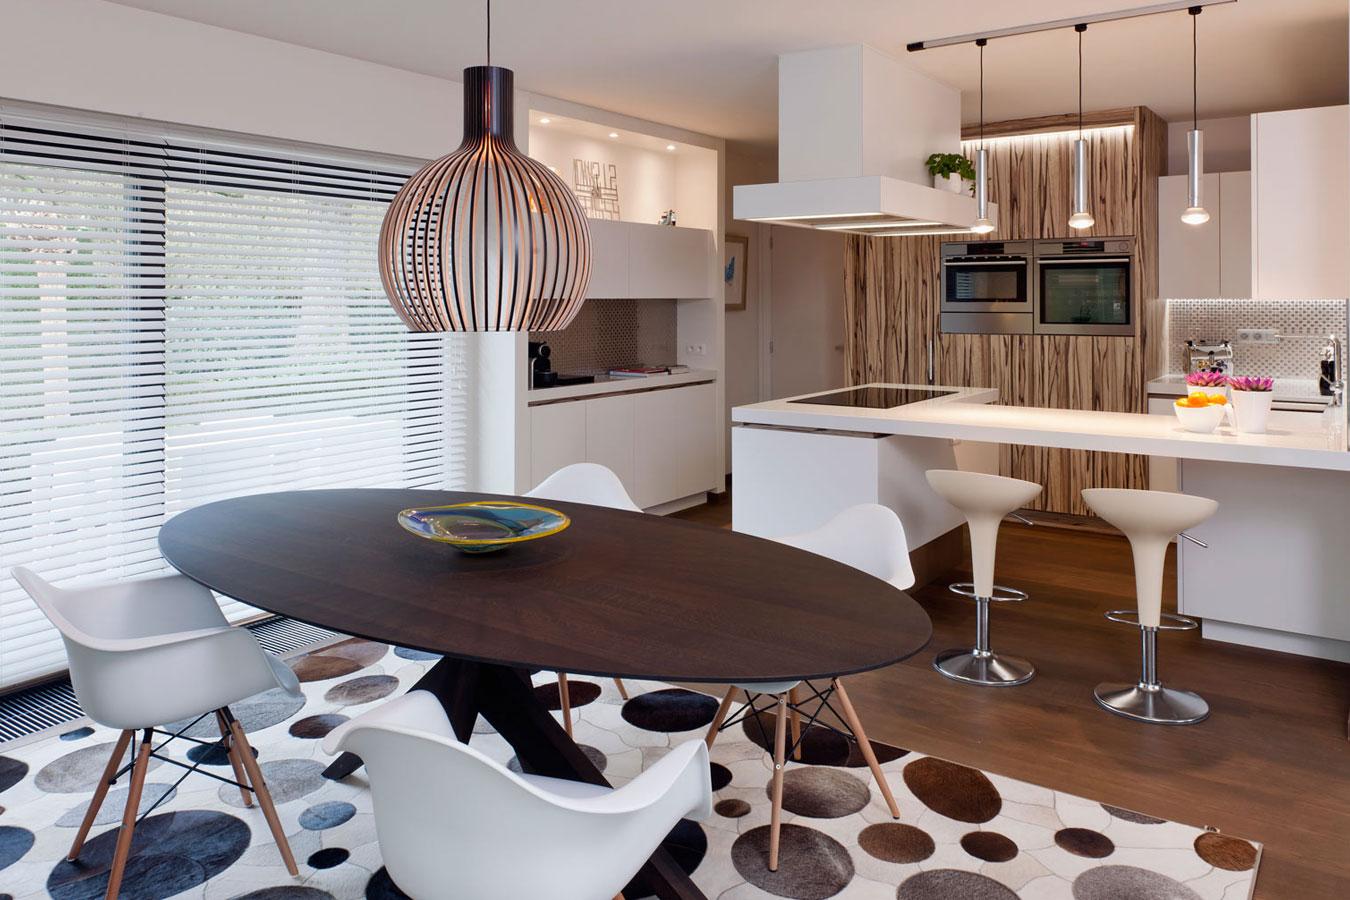 Beautiful Retro Eetkamer Contemporary - House Design Ideas 2018 ...